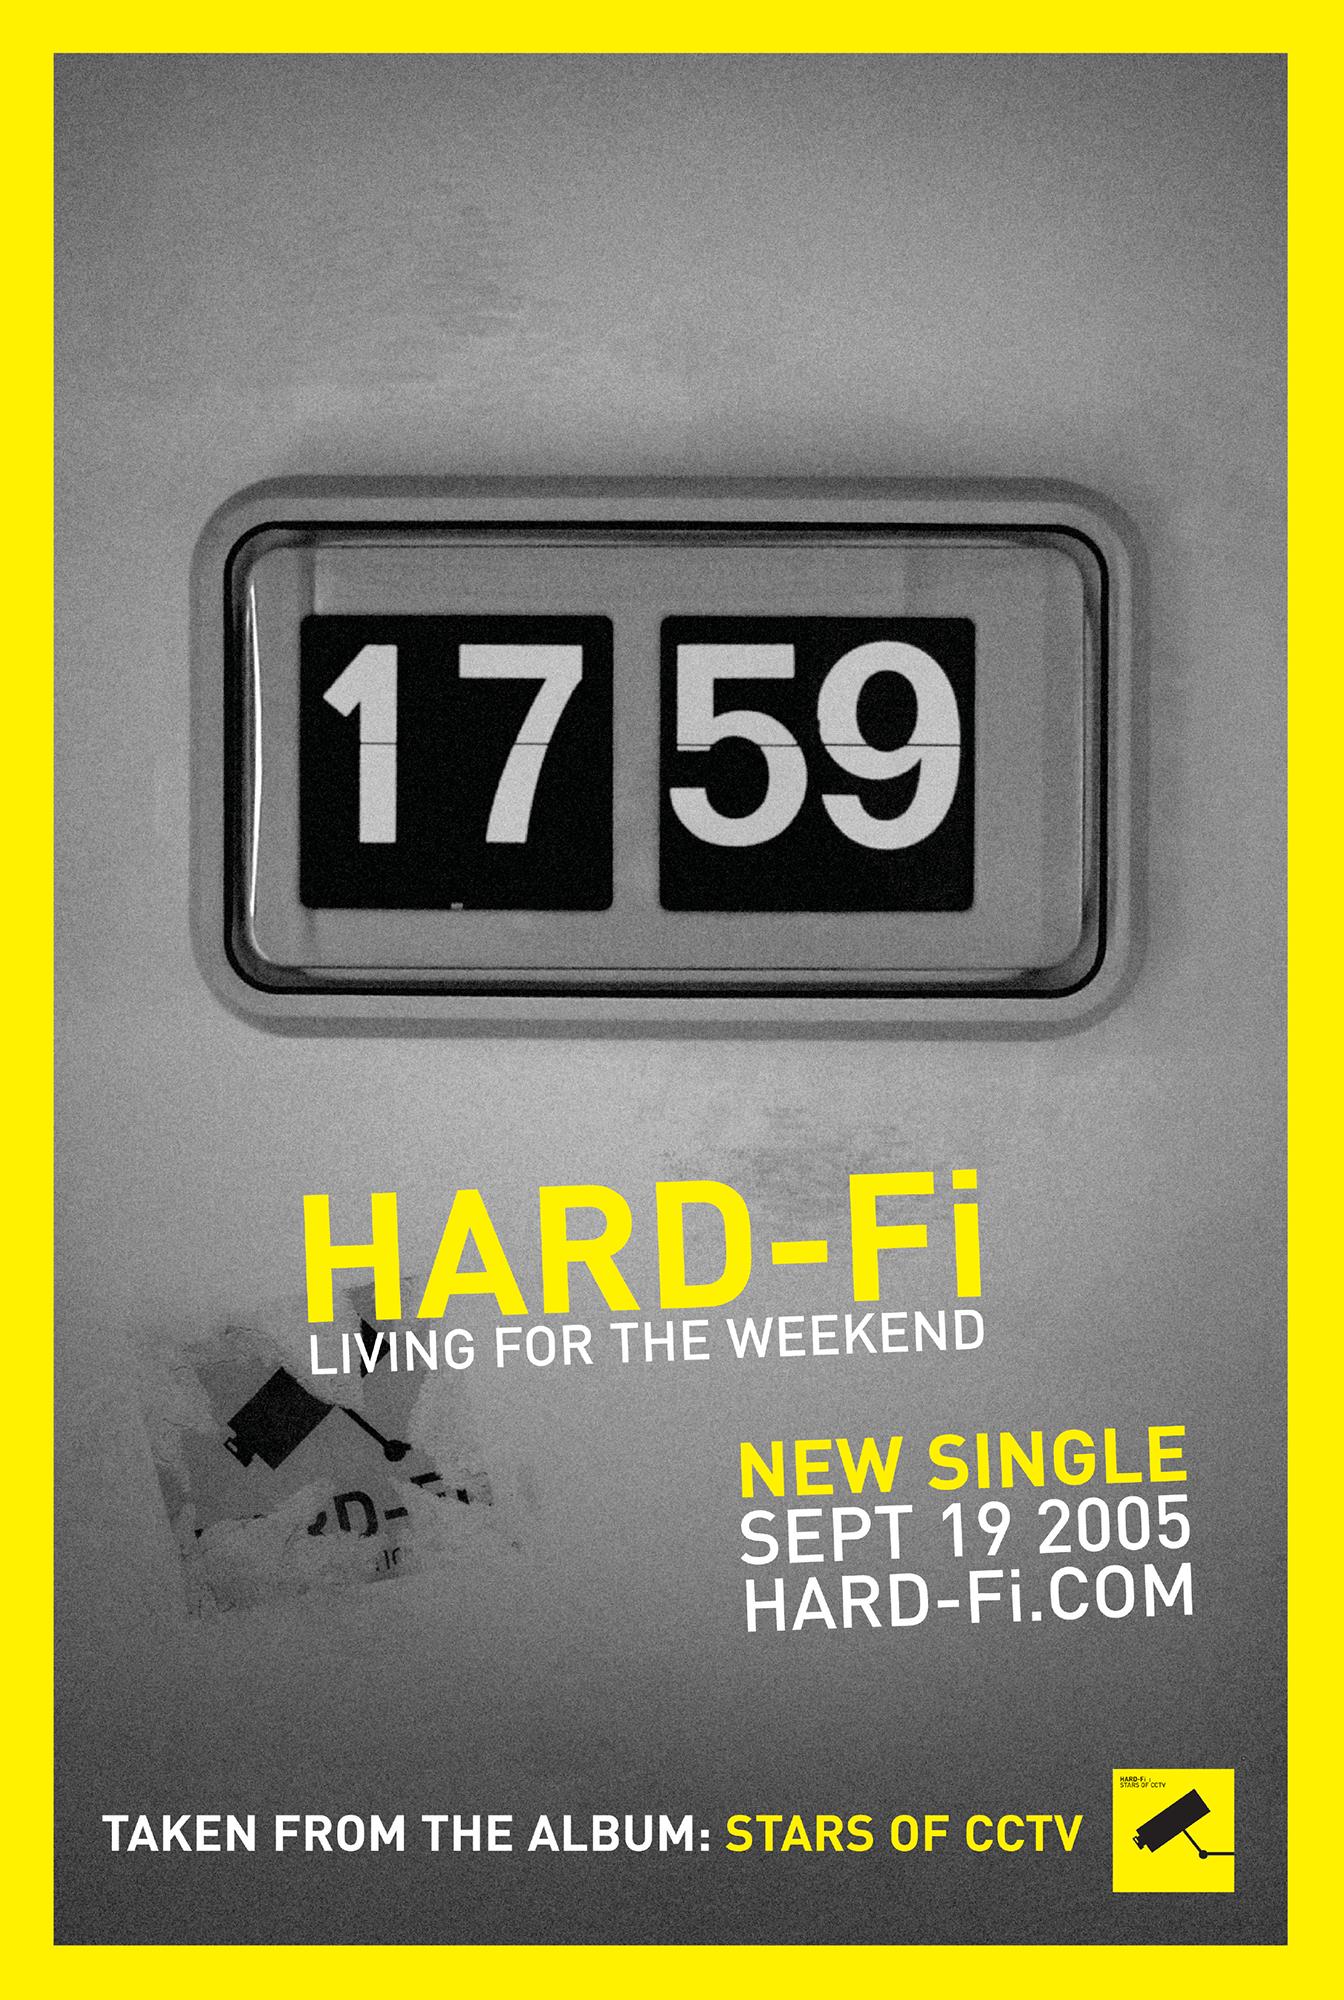 HardFi_work-14.png